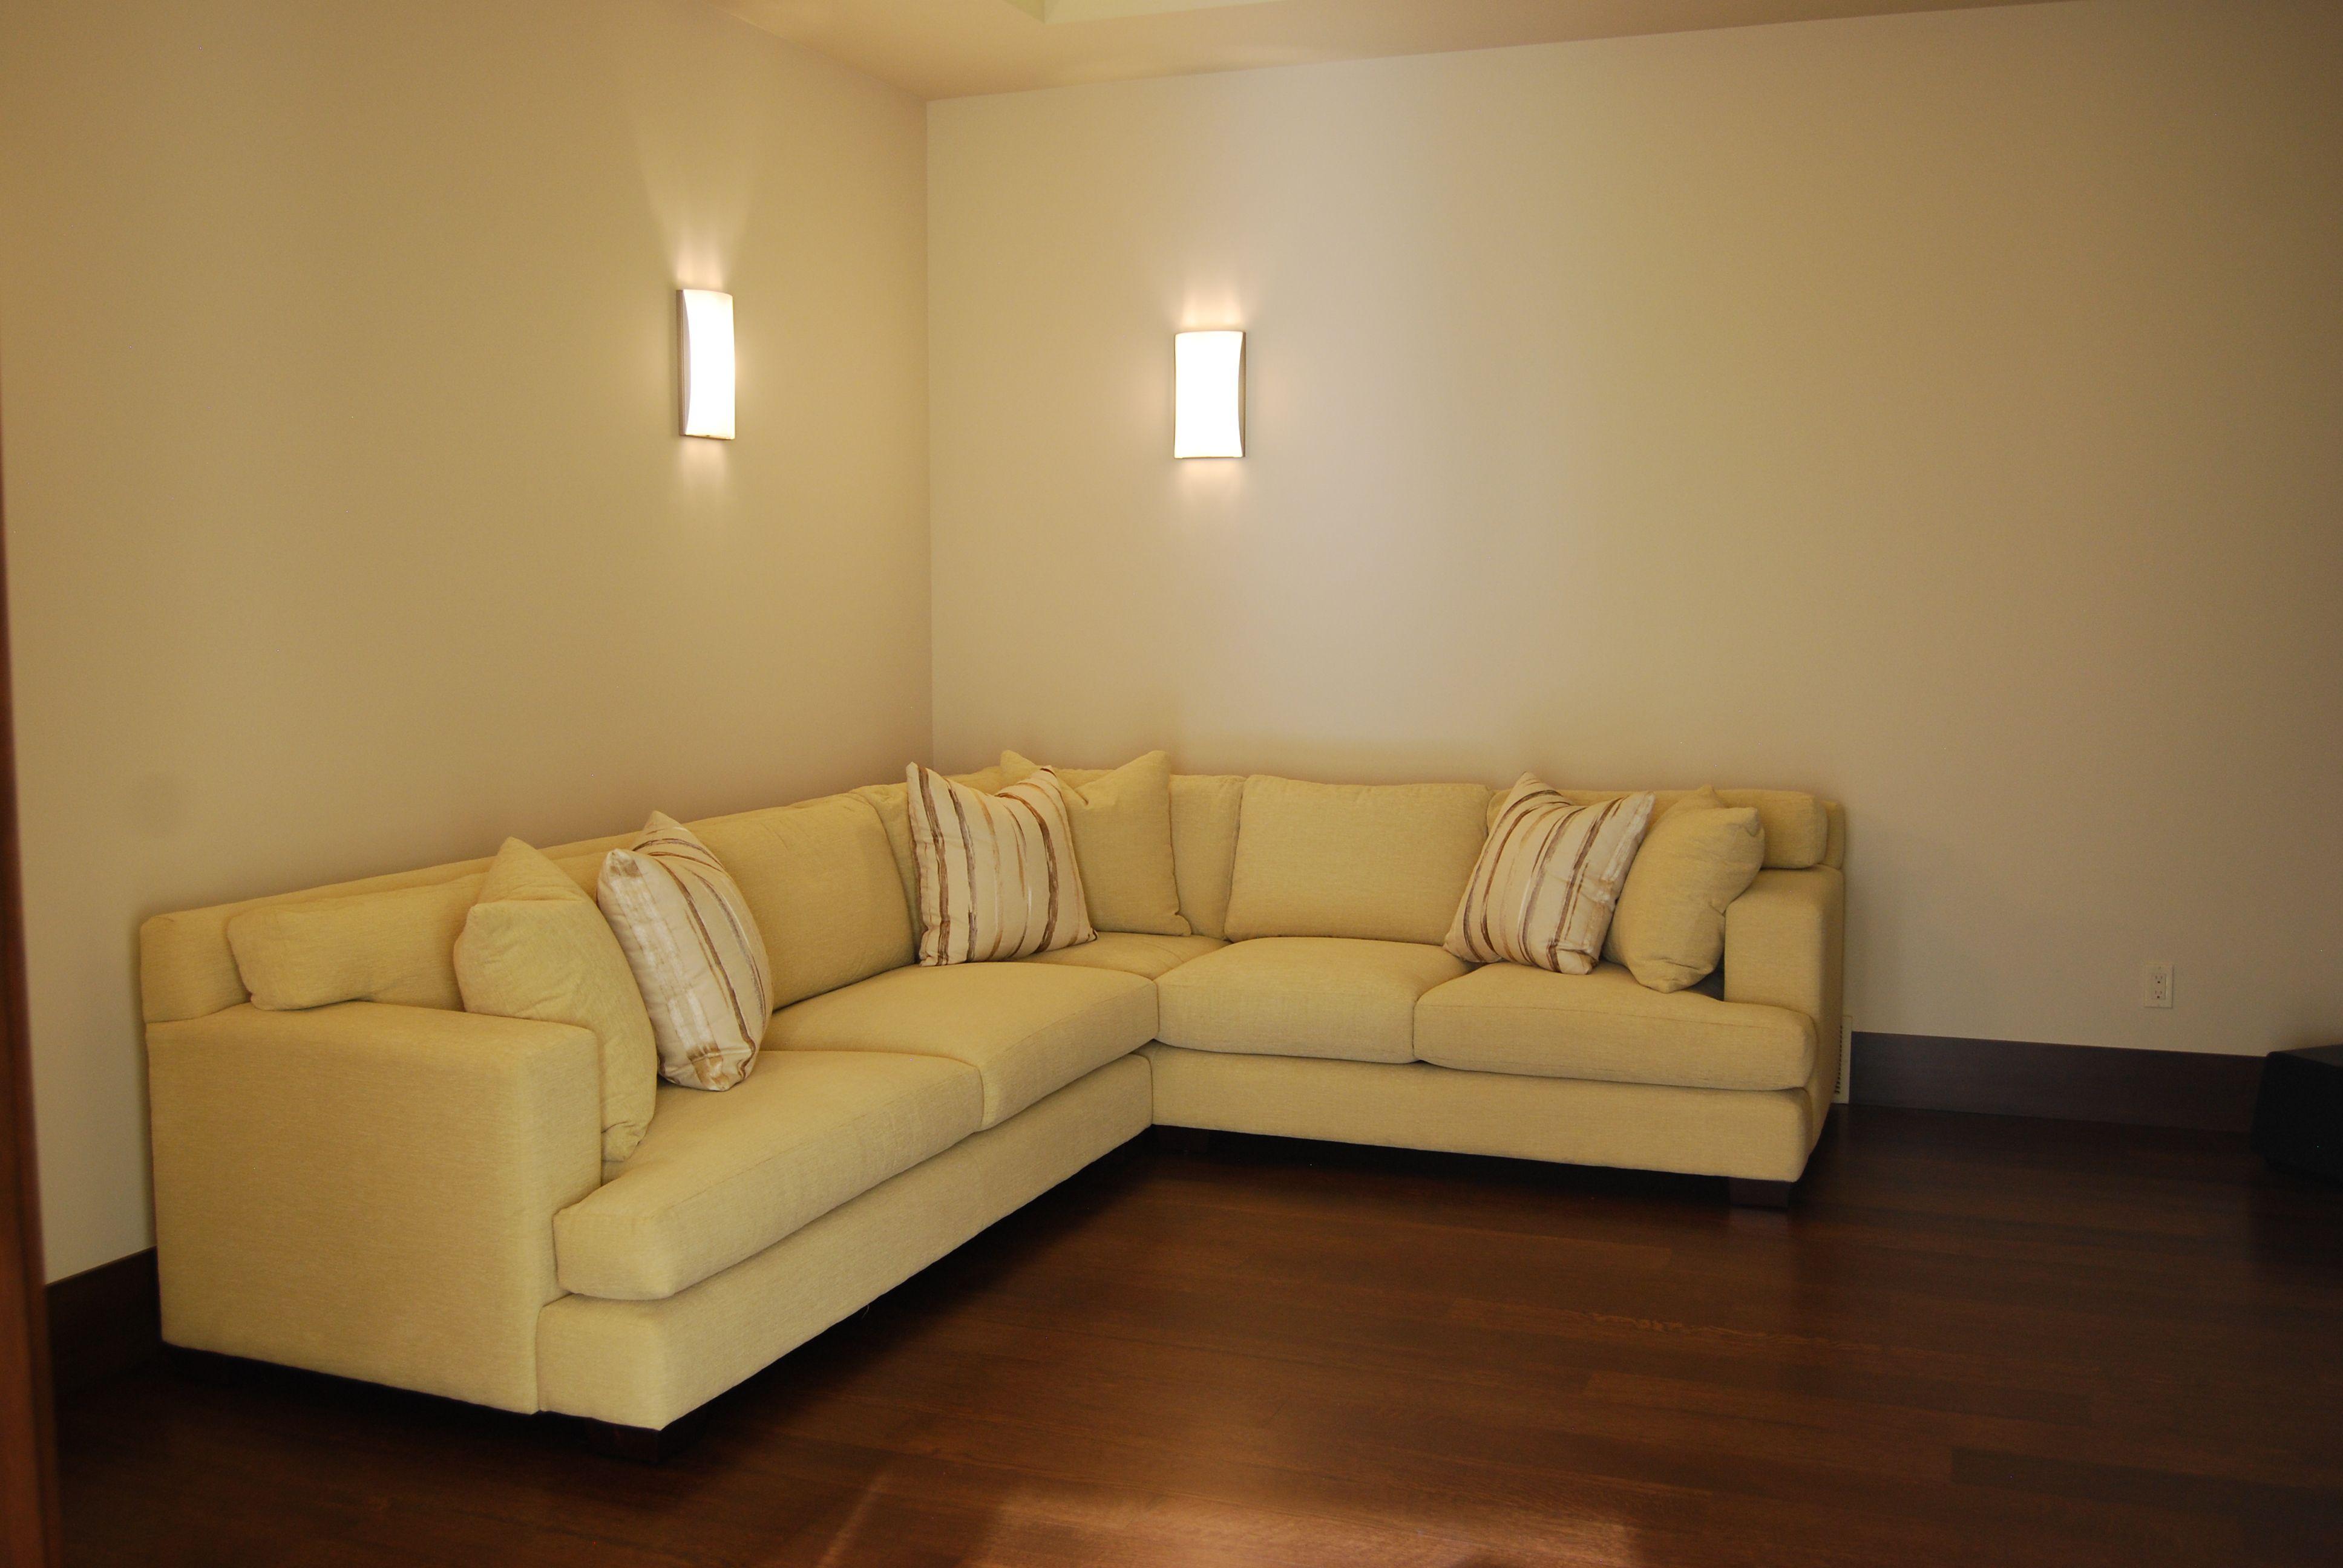 sofa sectional modern yellow design architecture utah